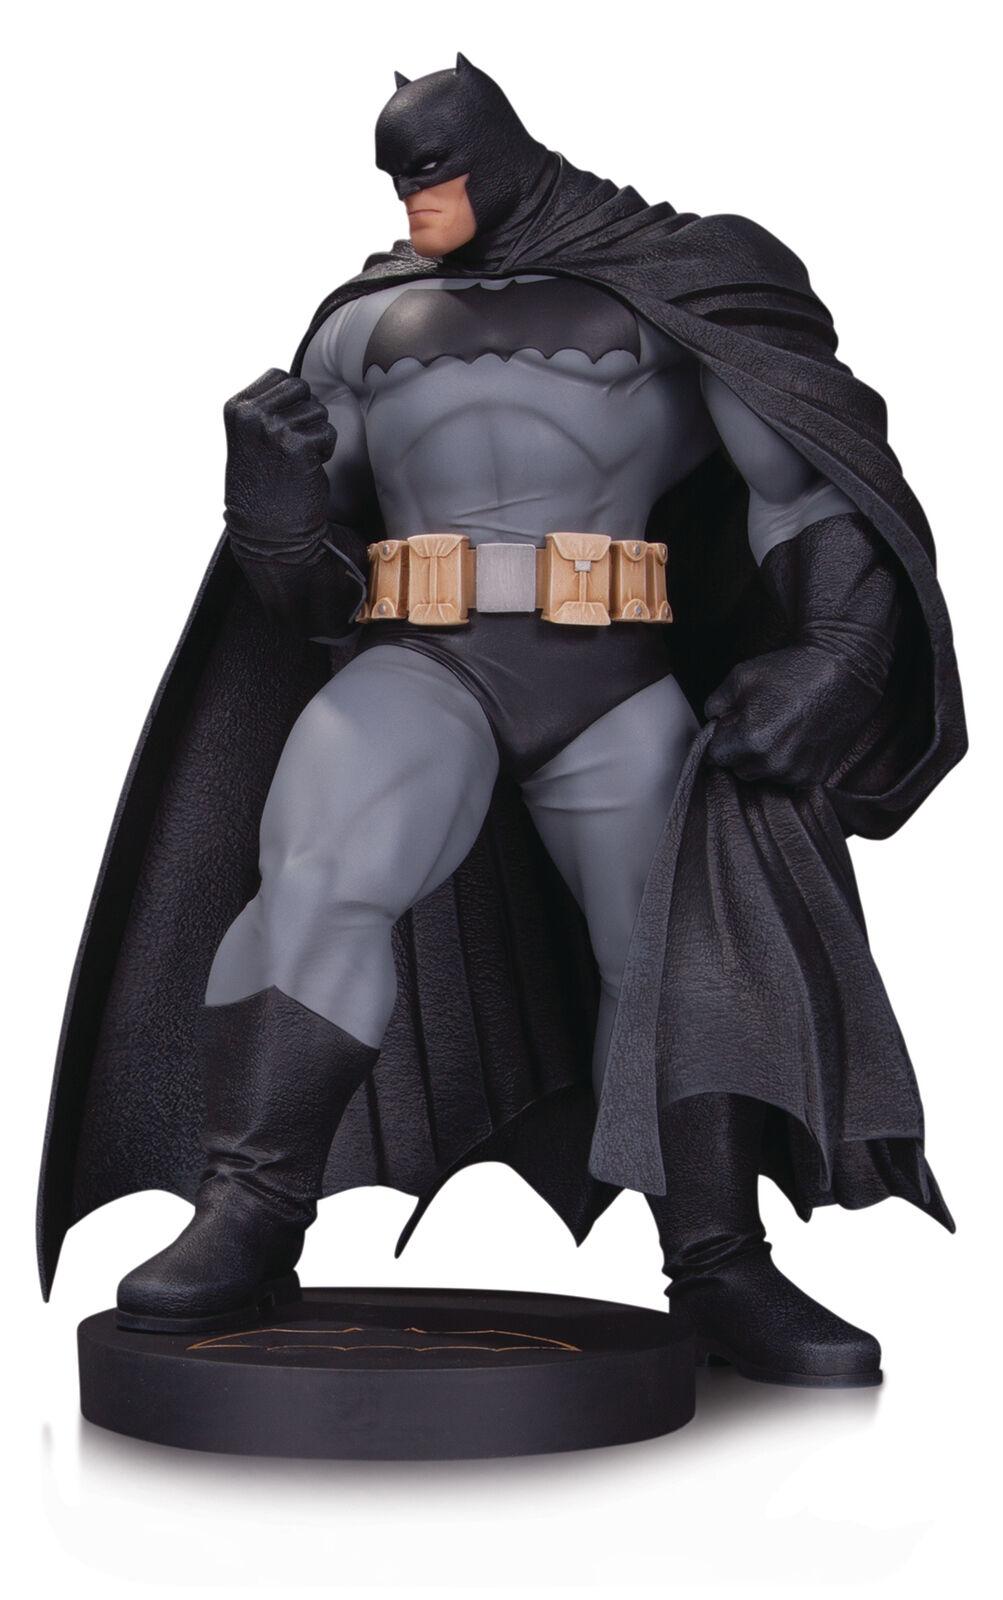 Dc Comics - Diseño Serie - Batman - Mini Estatua - por Andy Kubert